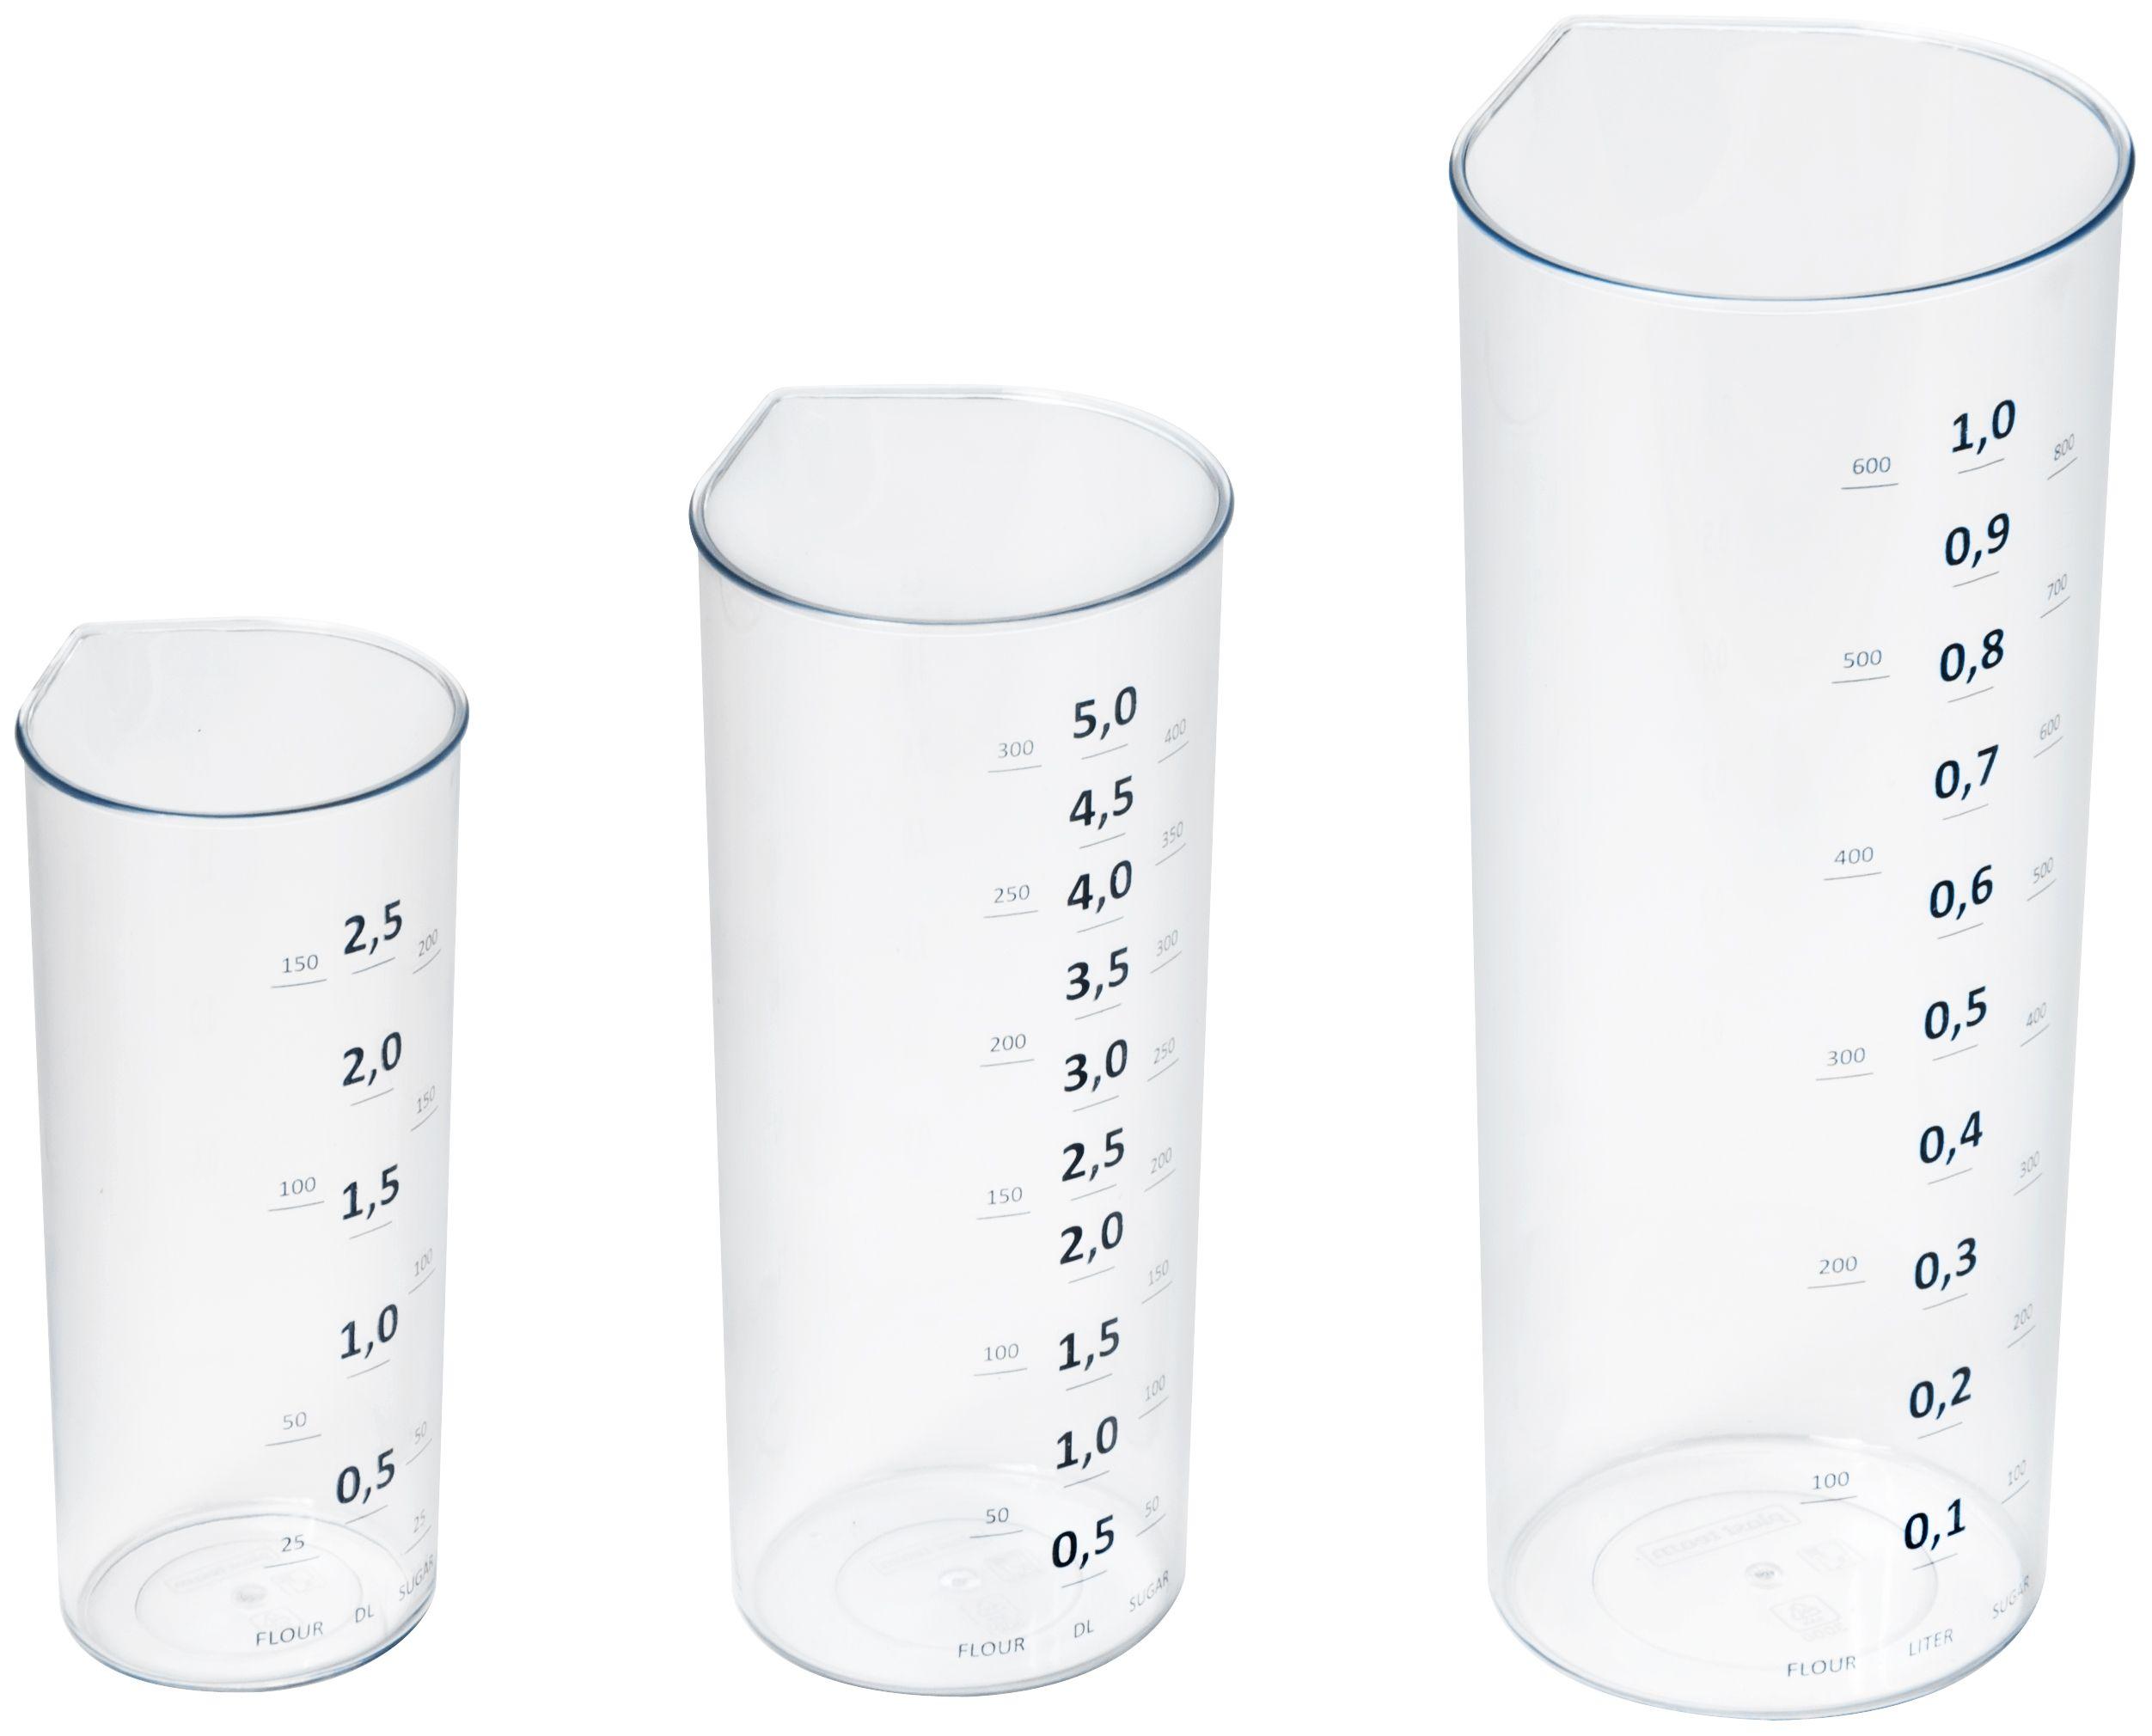 Image of Målebægre fra Plast team (25, 50, 100 ml) (30040800)